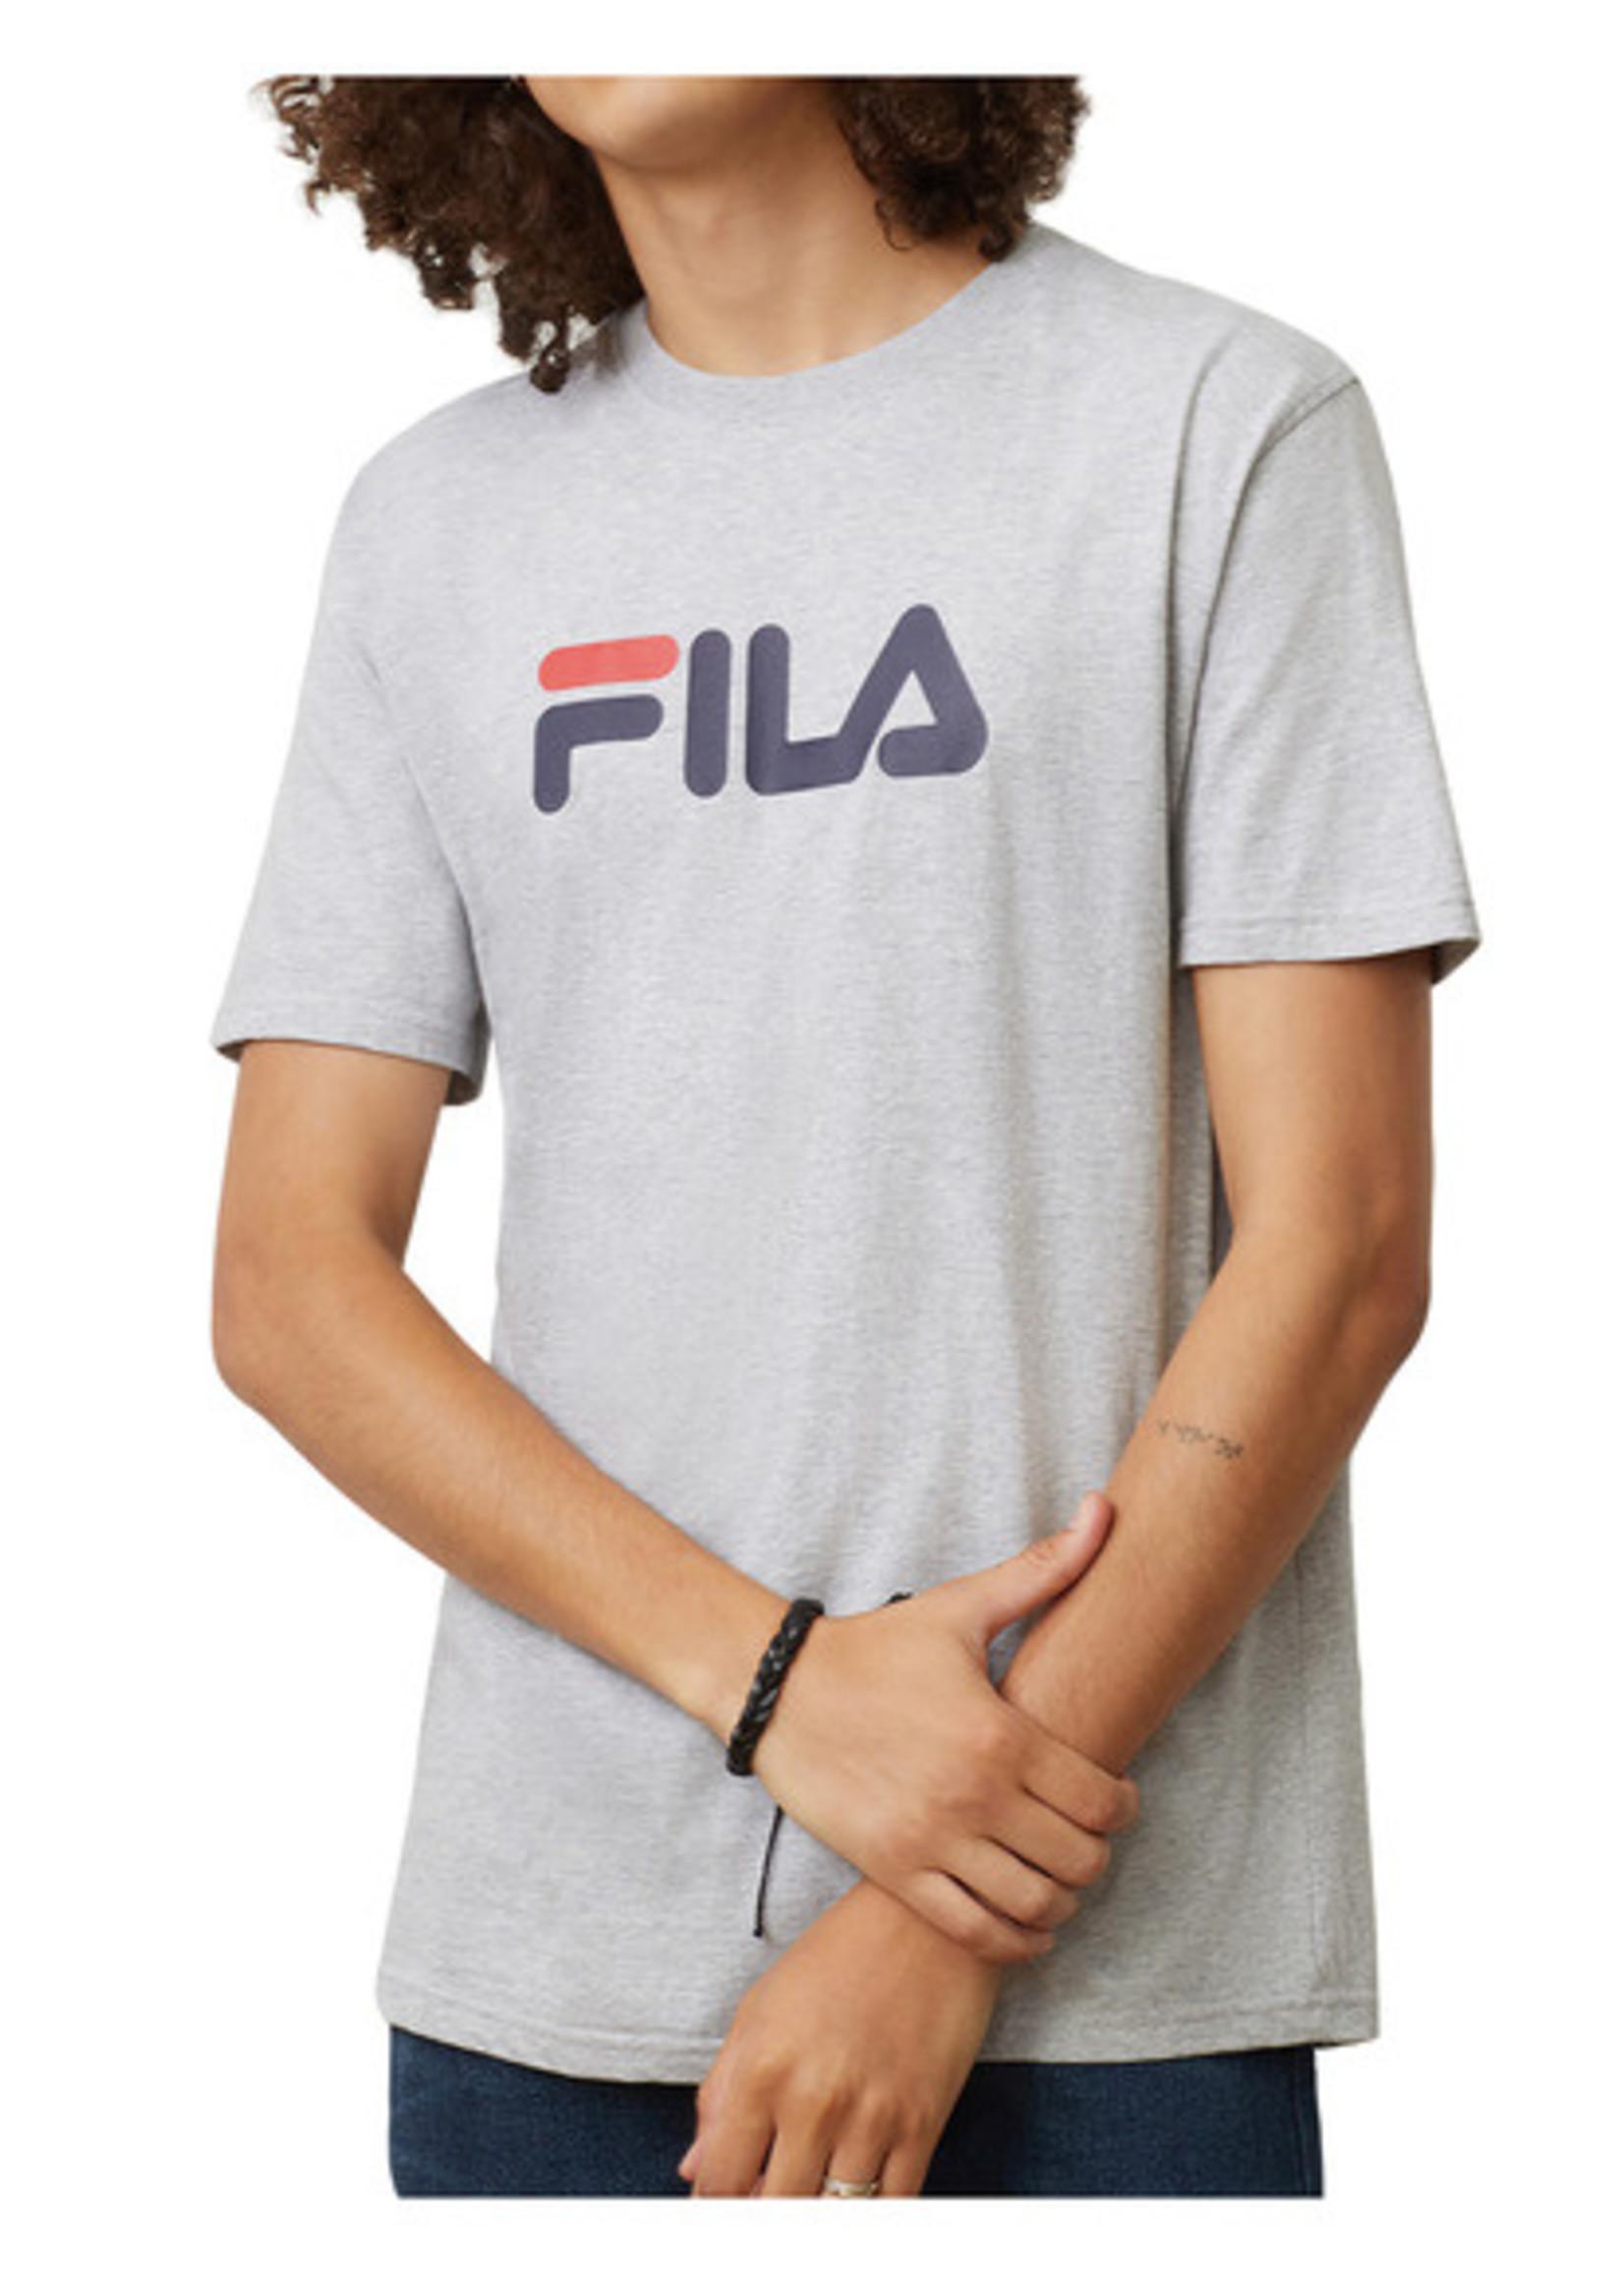 FILA FILA PRINTED TEE LM153RW5